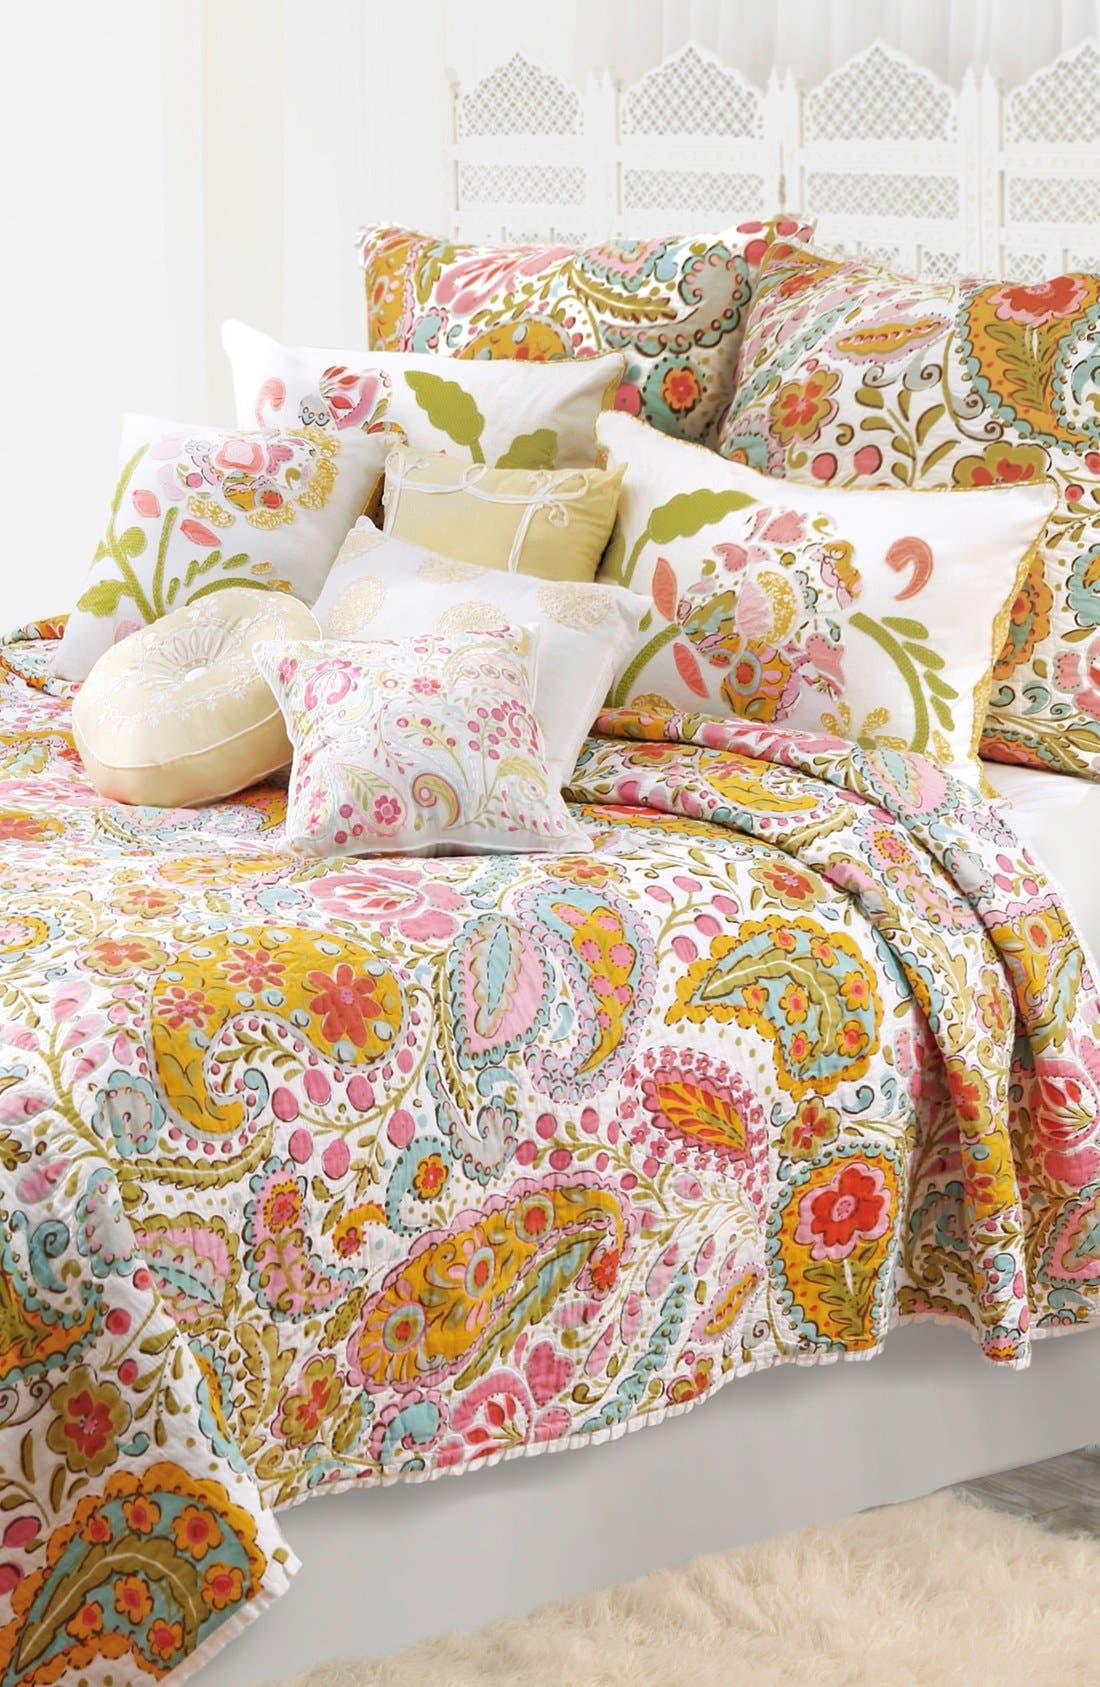 Alternate Image 1 Selected - Dena Home 'Sunbeam' Quilt